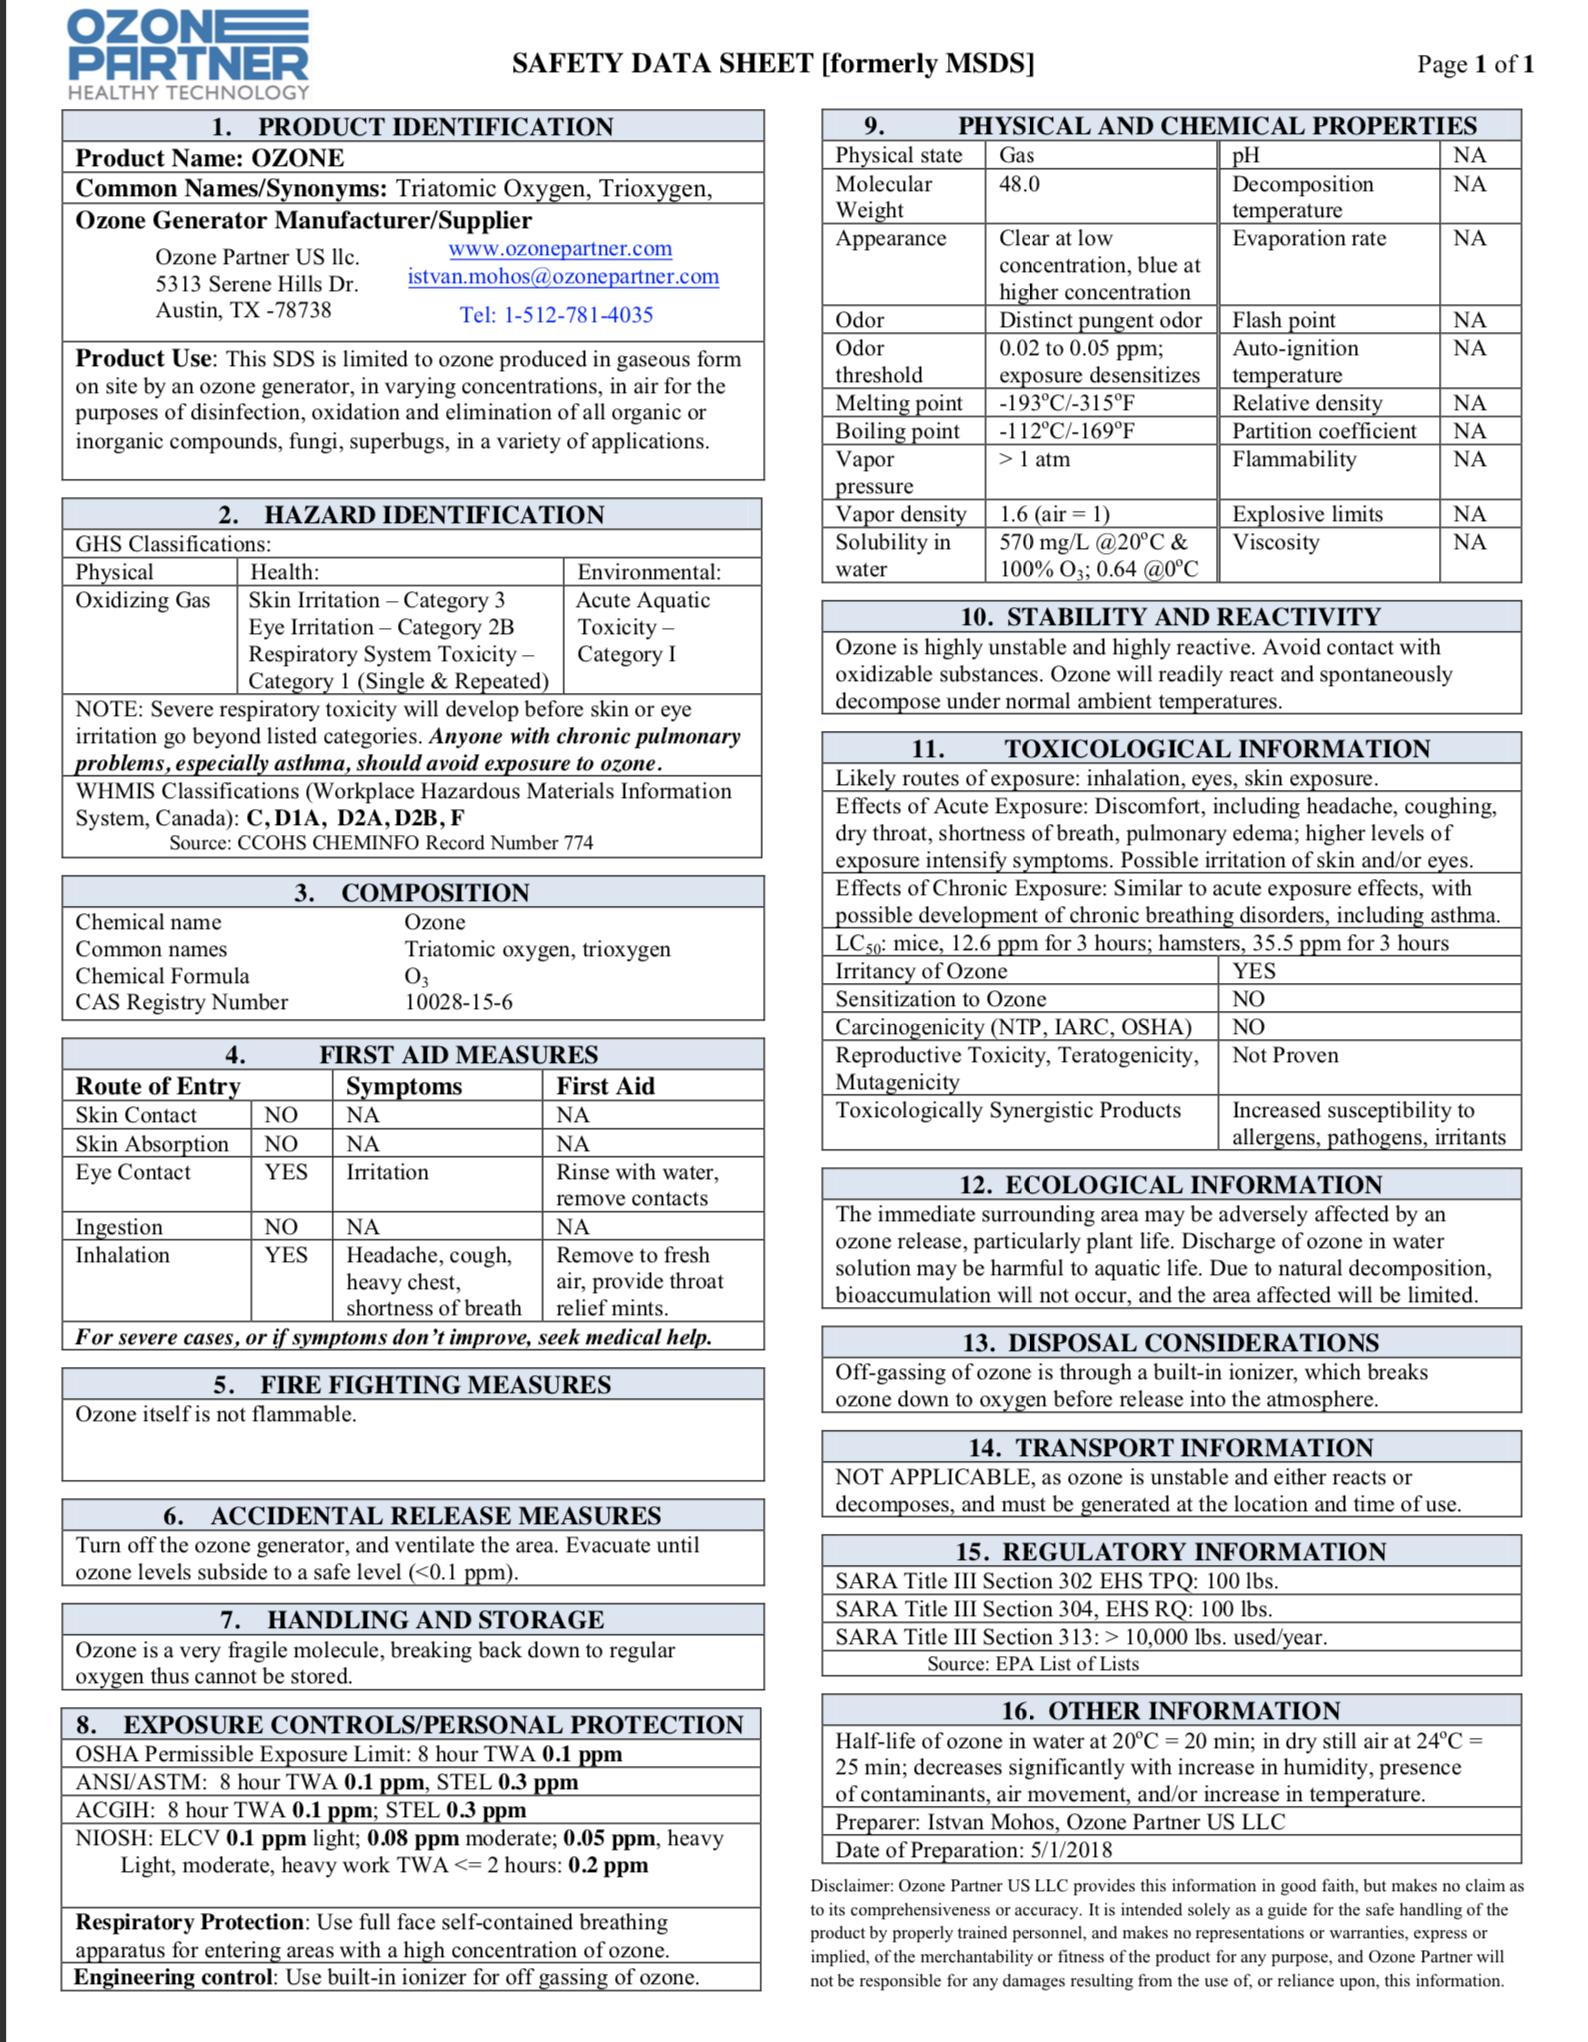 View MSDS Sheet